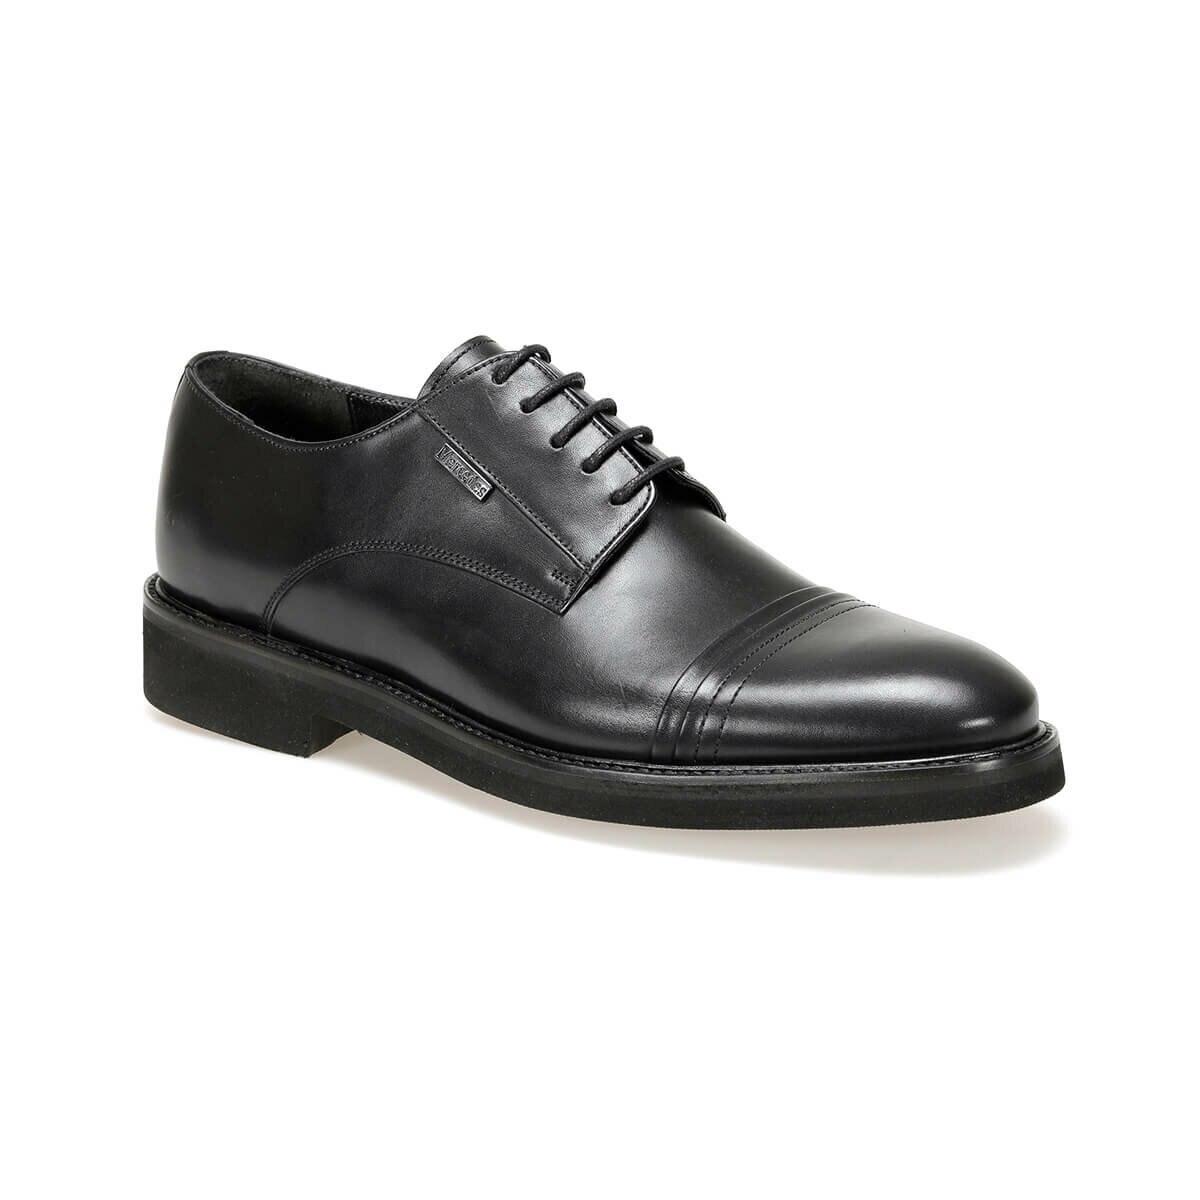 FLO Men Classic Black Casual Dress Fashion Male Formal Business Shoes Мужская обувь BOGDAN 9PR MERCEDES